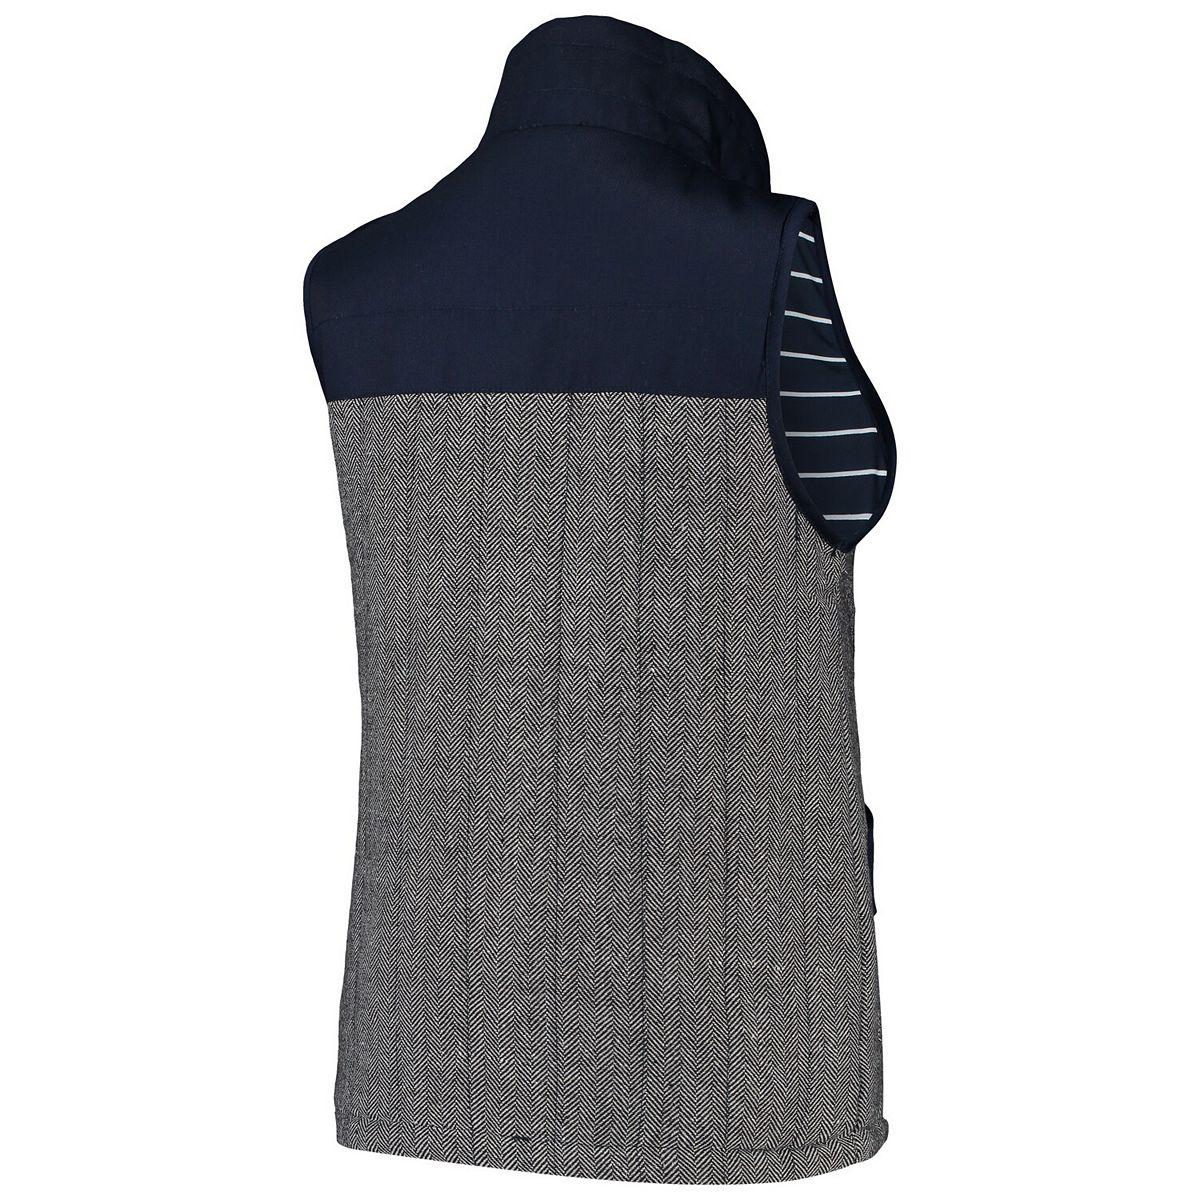 Women's Navy Auburn Tigers Prep For It Herringbone Knit Full-Zip Vest egOKE